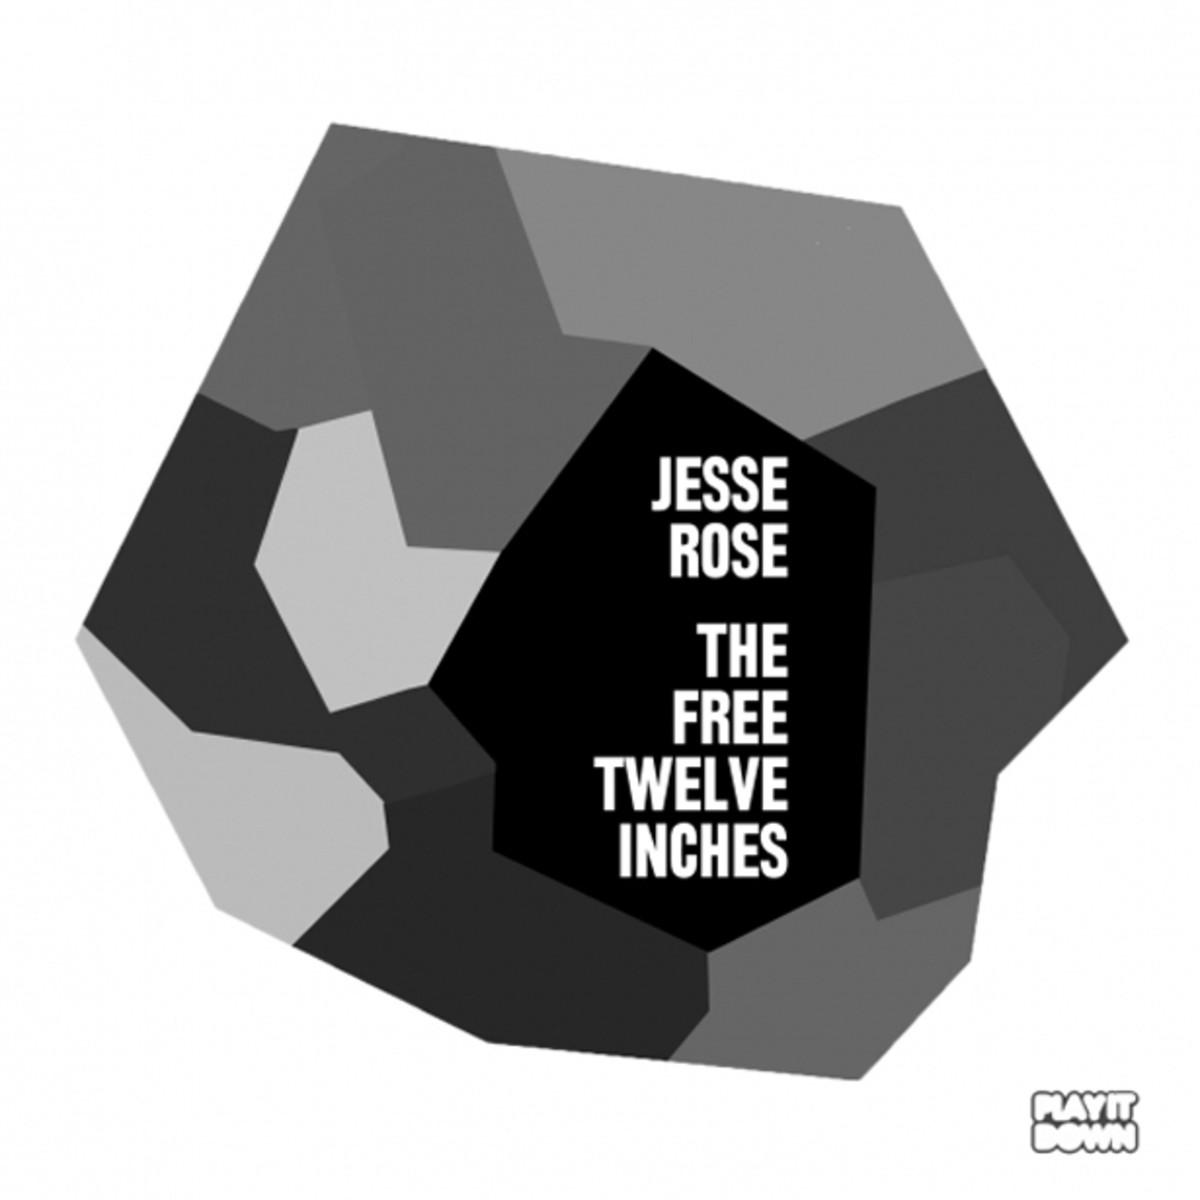 Jesse Rose Shares 12 Tracks For 12 Days As Free EDM Downloads